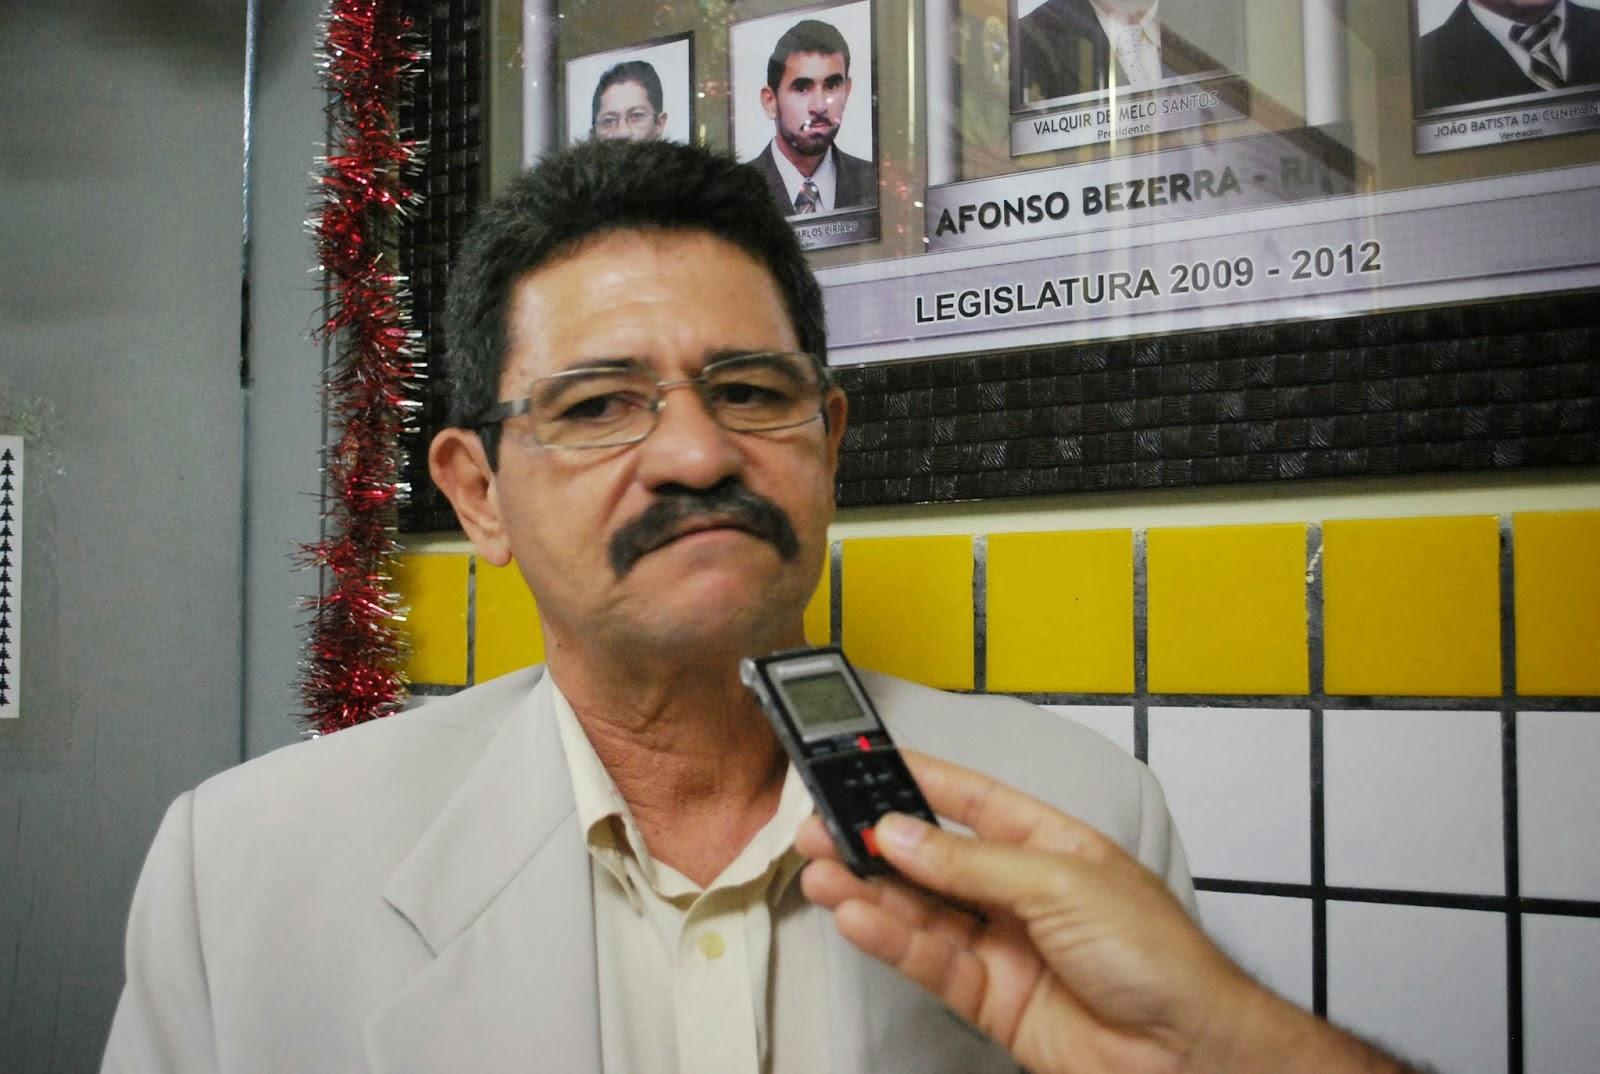 Resultado de imagem para ex-prefeito de Afonso Bezerra, José Robson de Souza,